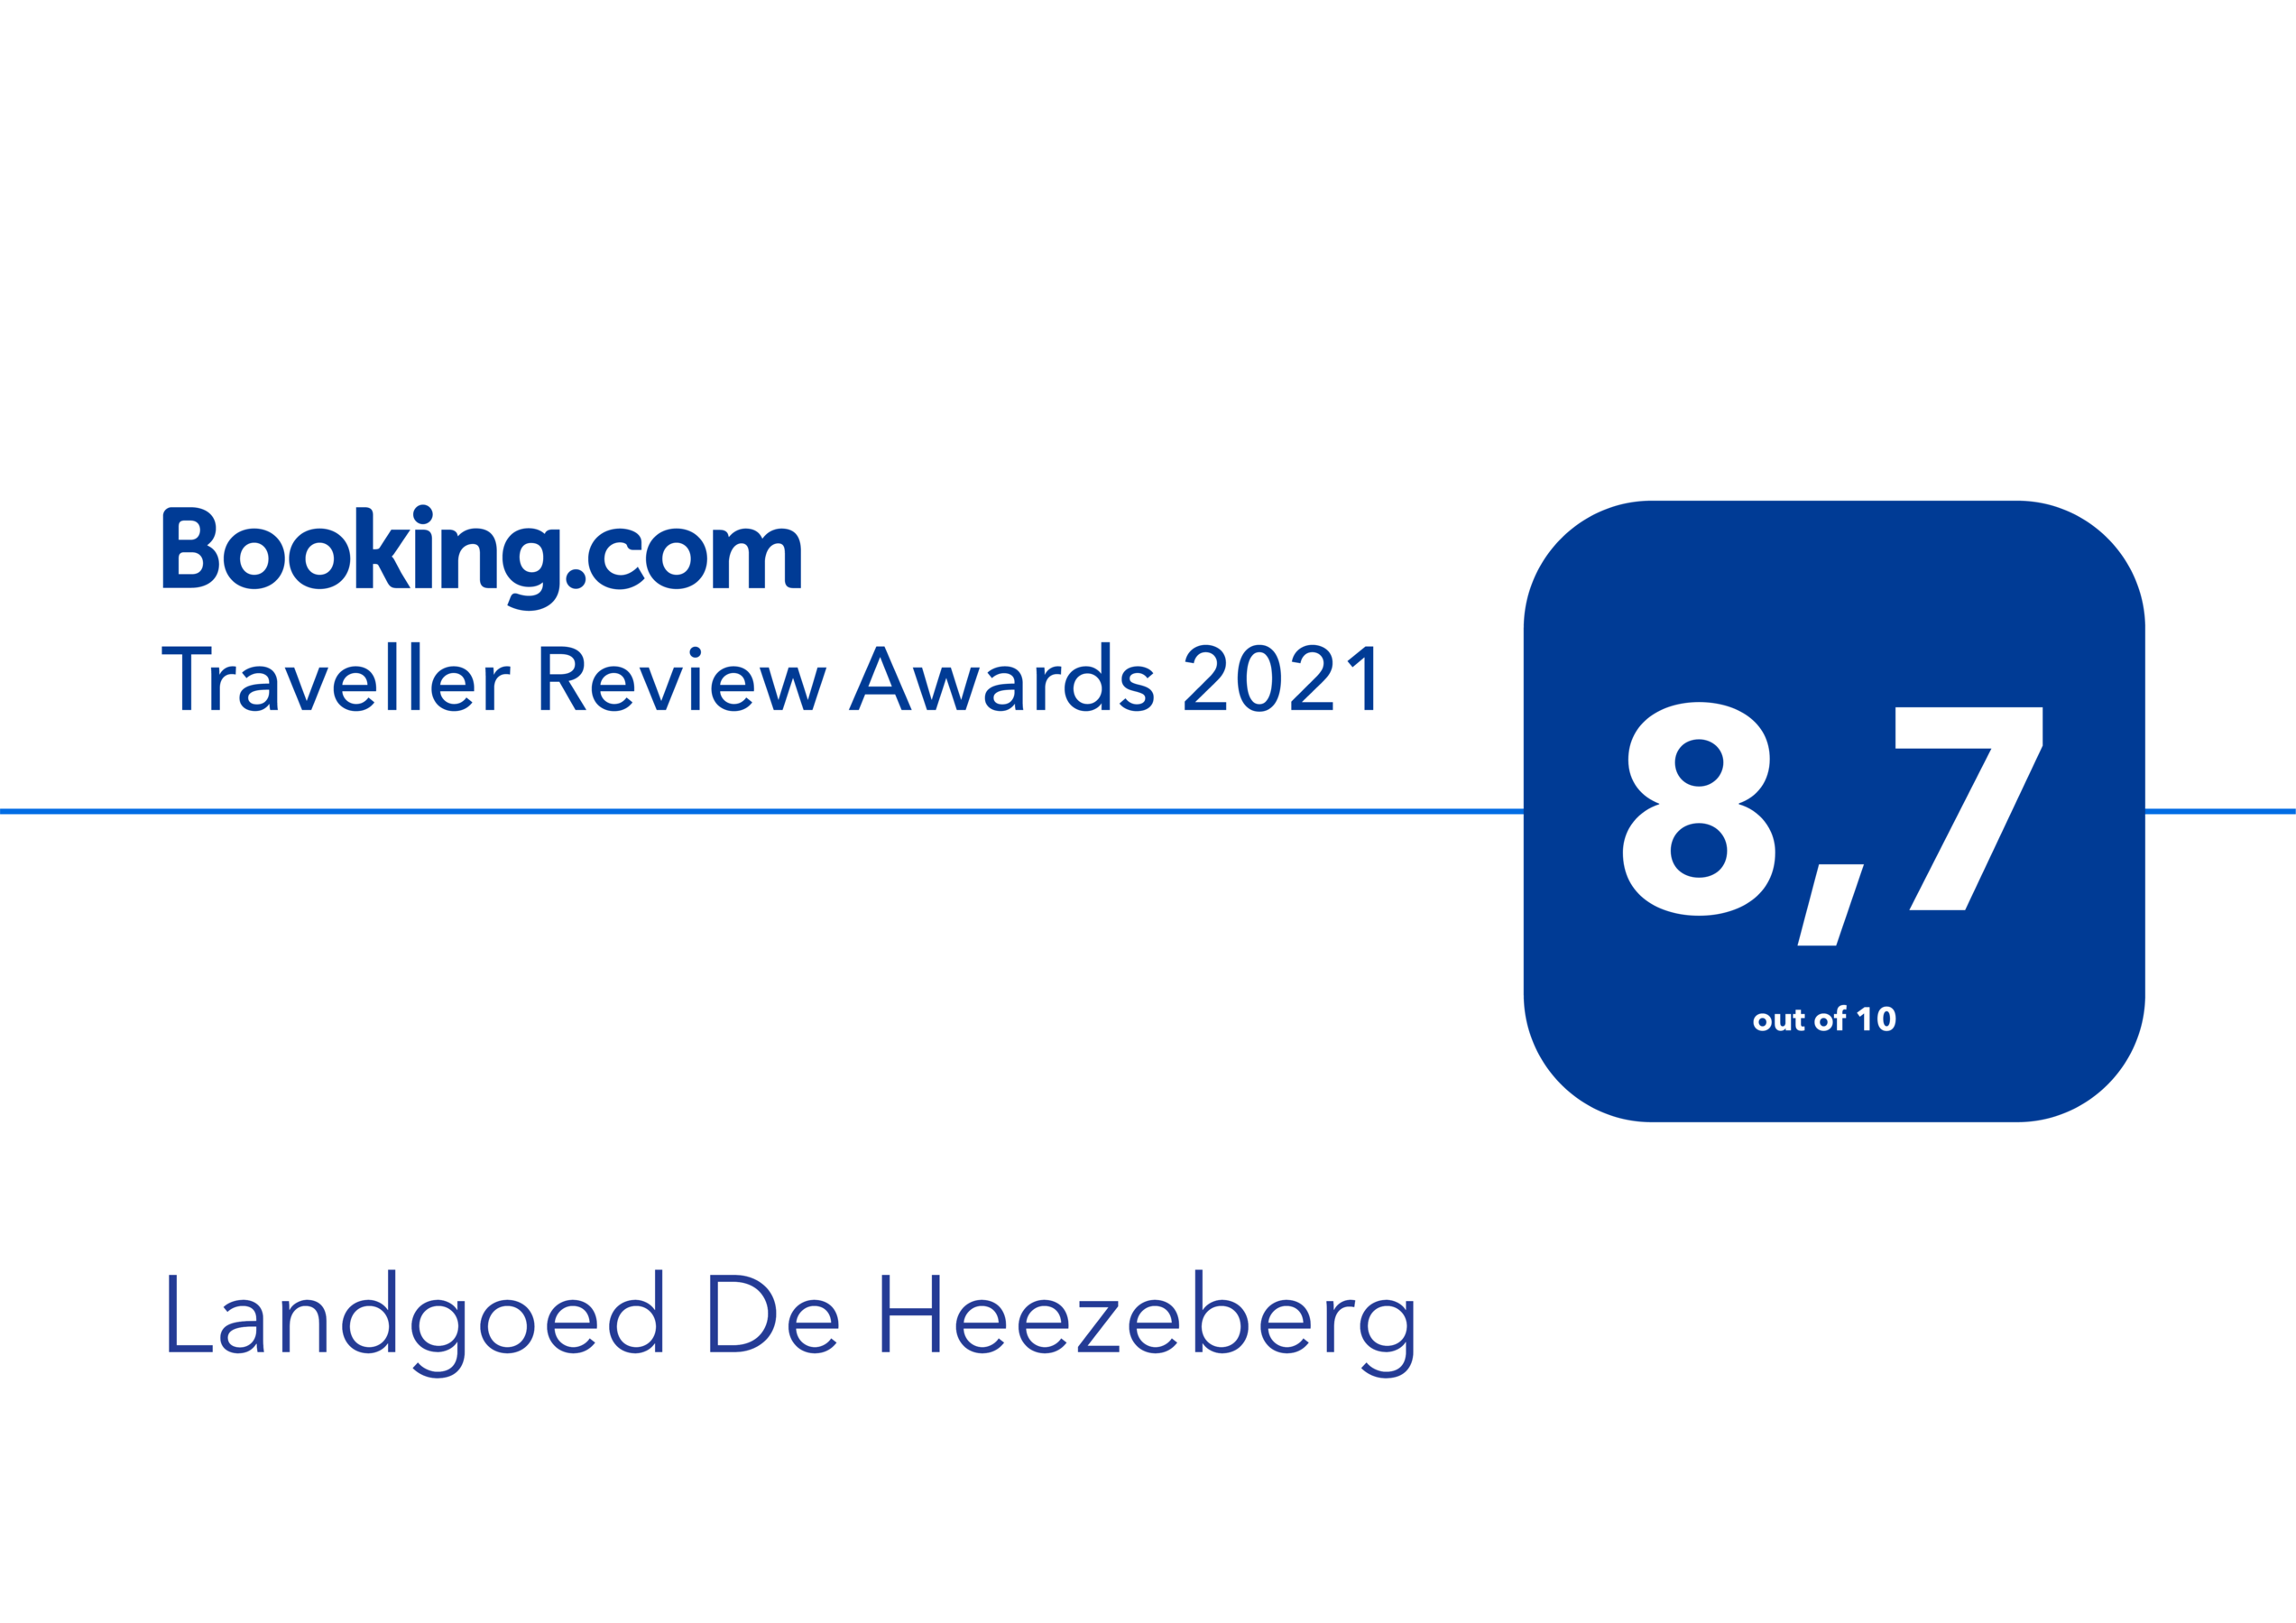 Booking.com Traveller Review Awards 2021 - 8,7